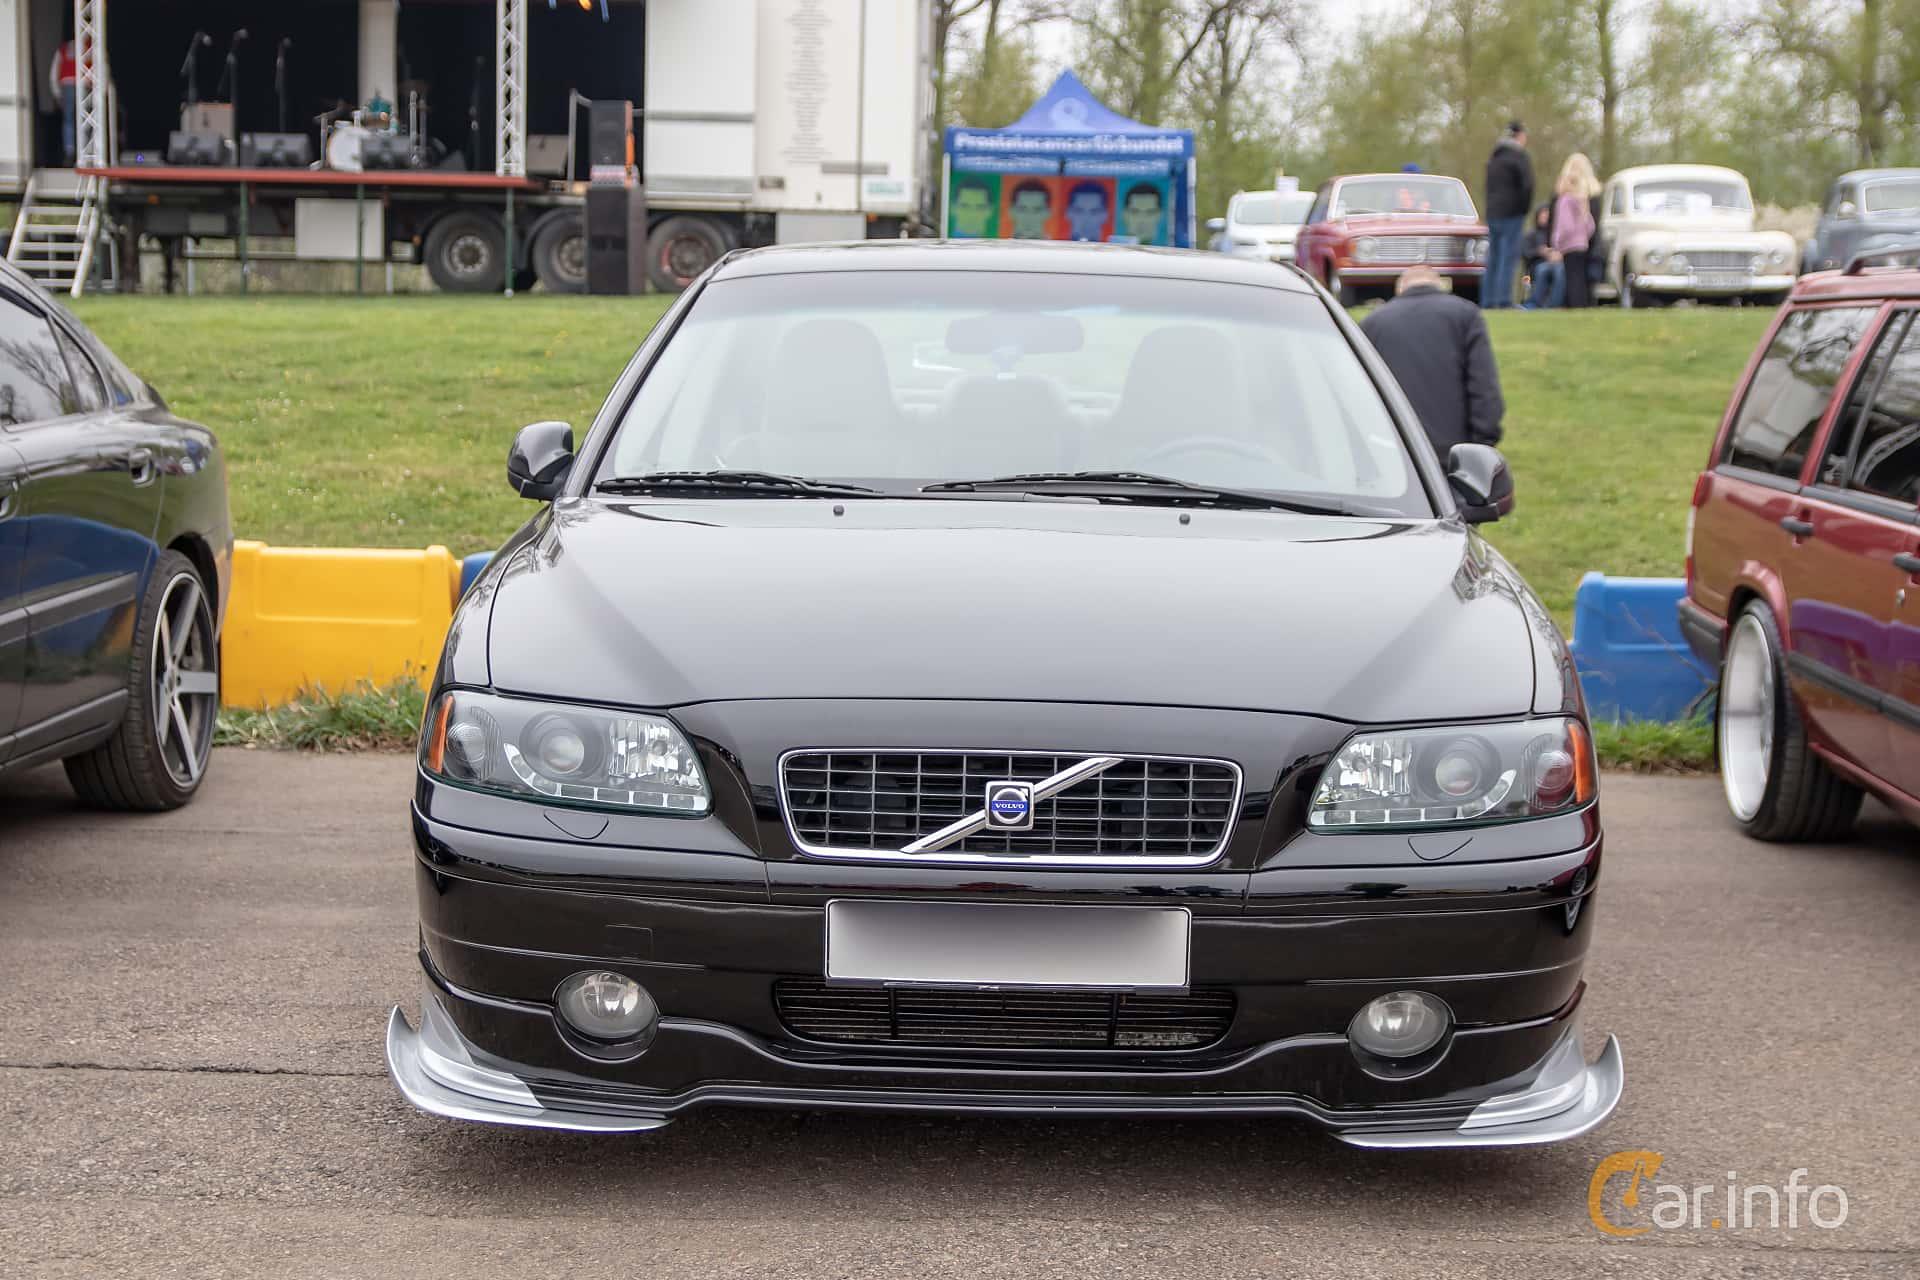 Volvo S60 2.4T Manual, 200hp, 2002 at Lucys motorfest 2019